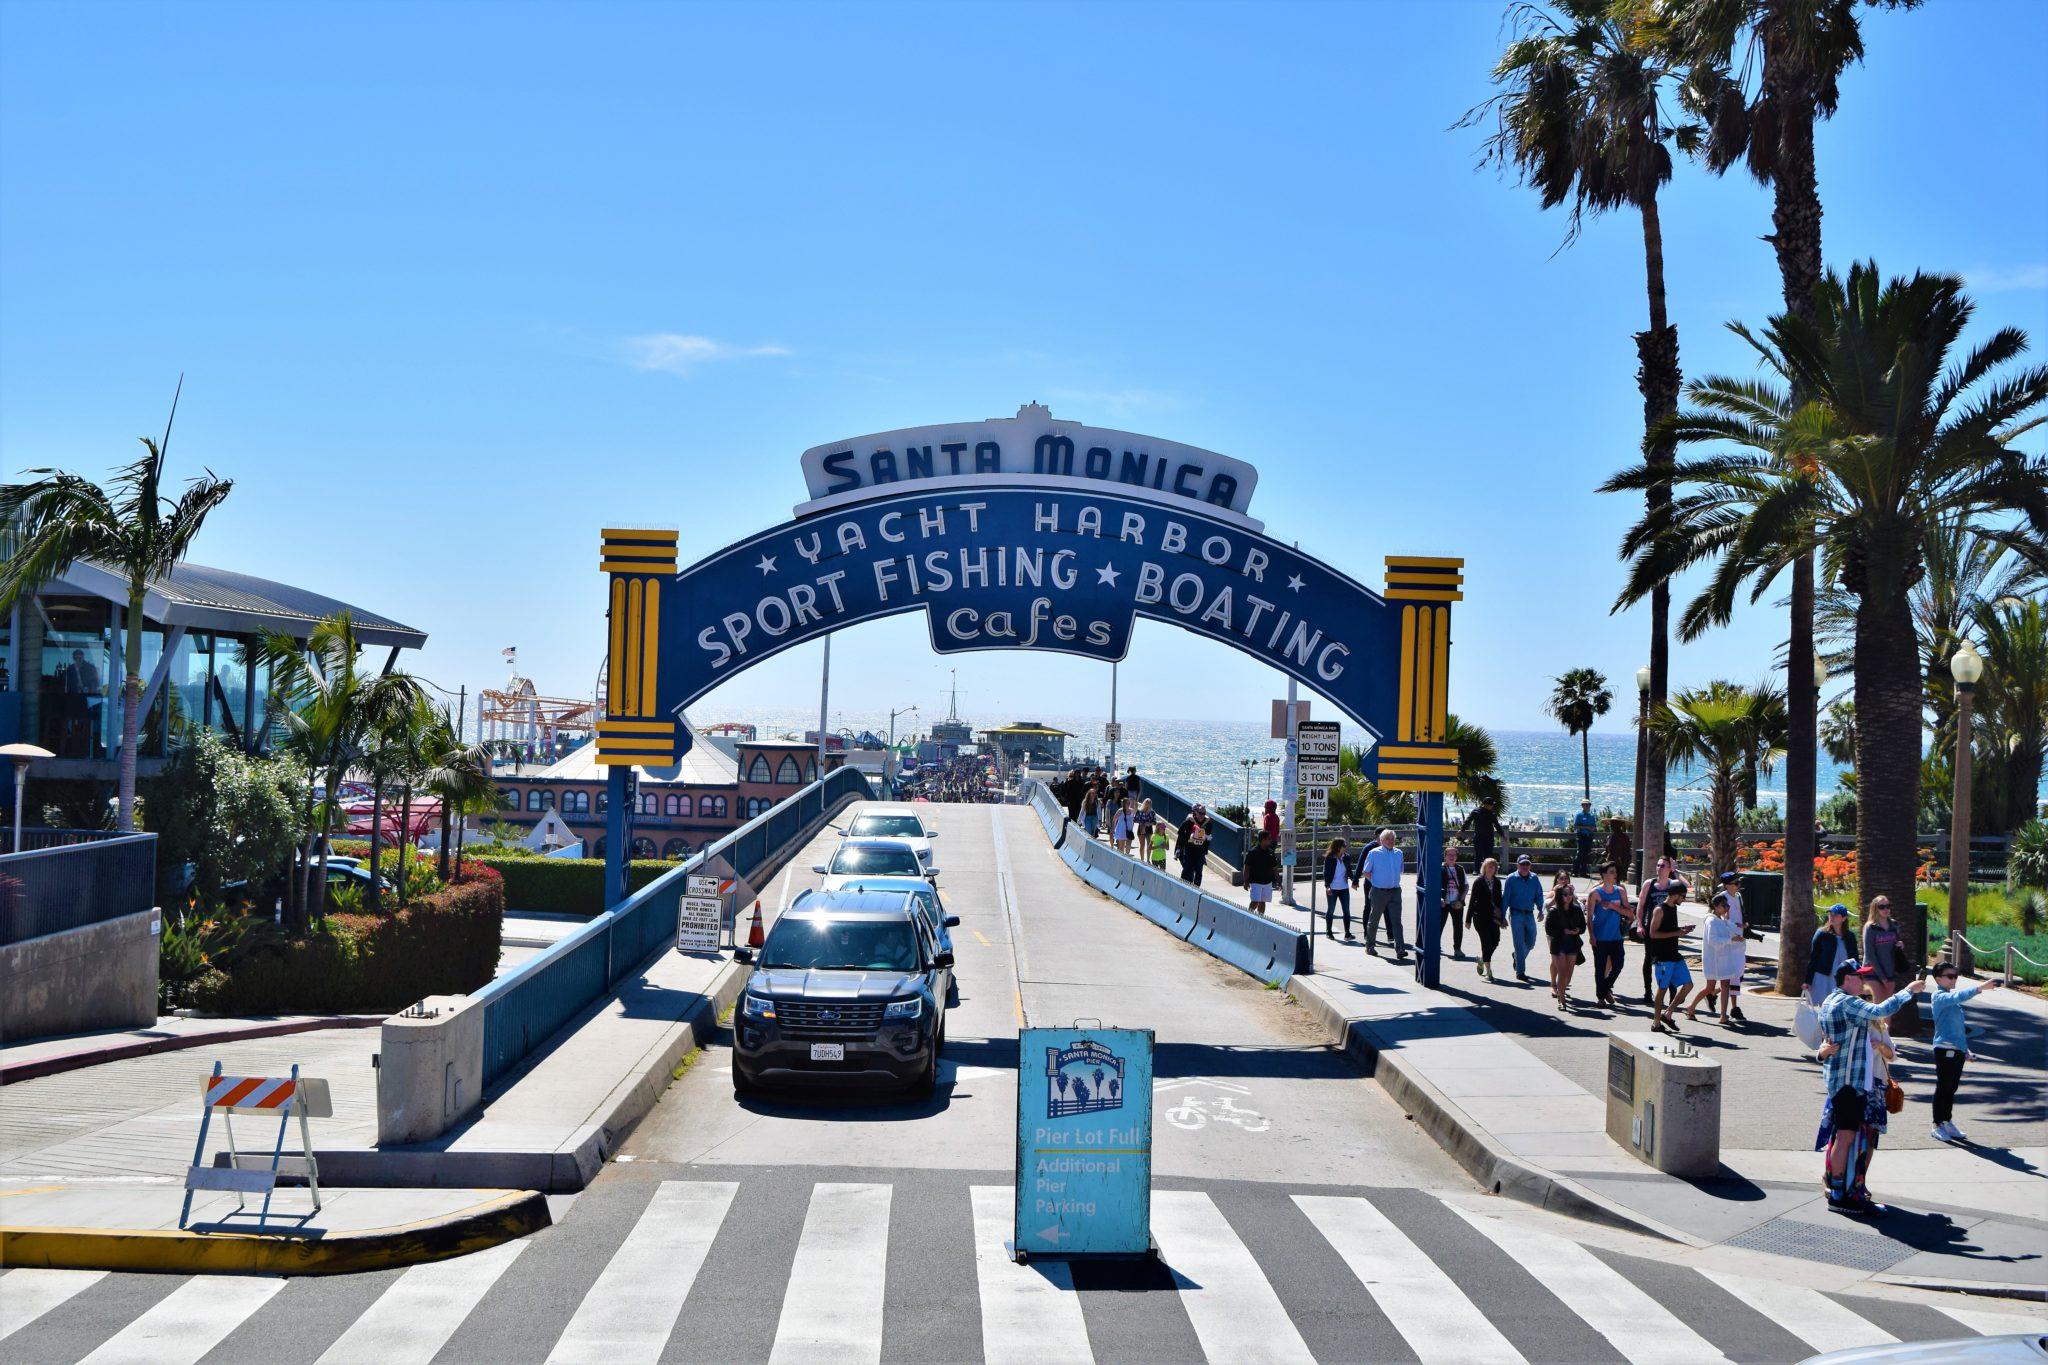 Los Angeles Santa Monica Beach Bus Best On The World 2017